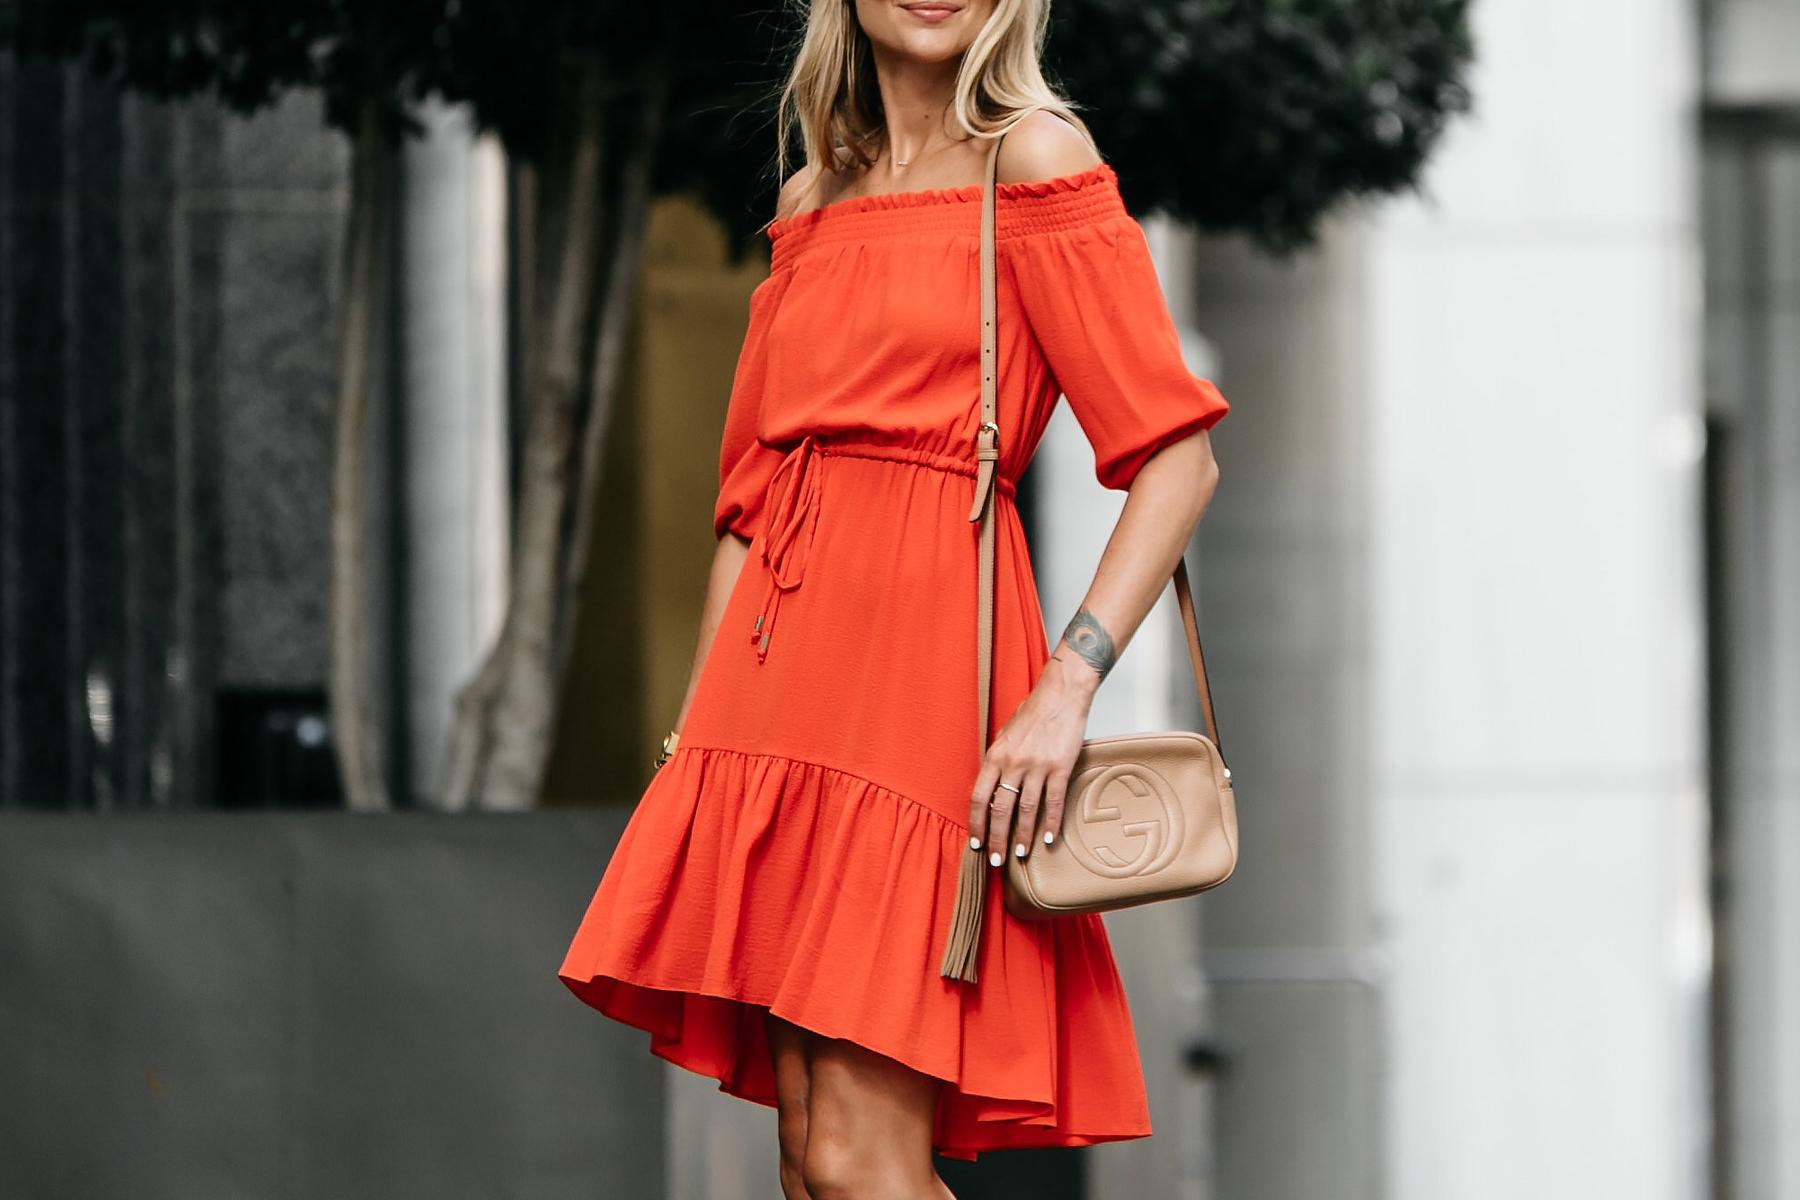 Vince Camuto Red off-the-shoulder Dress